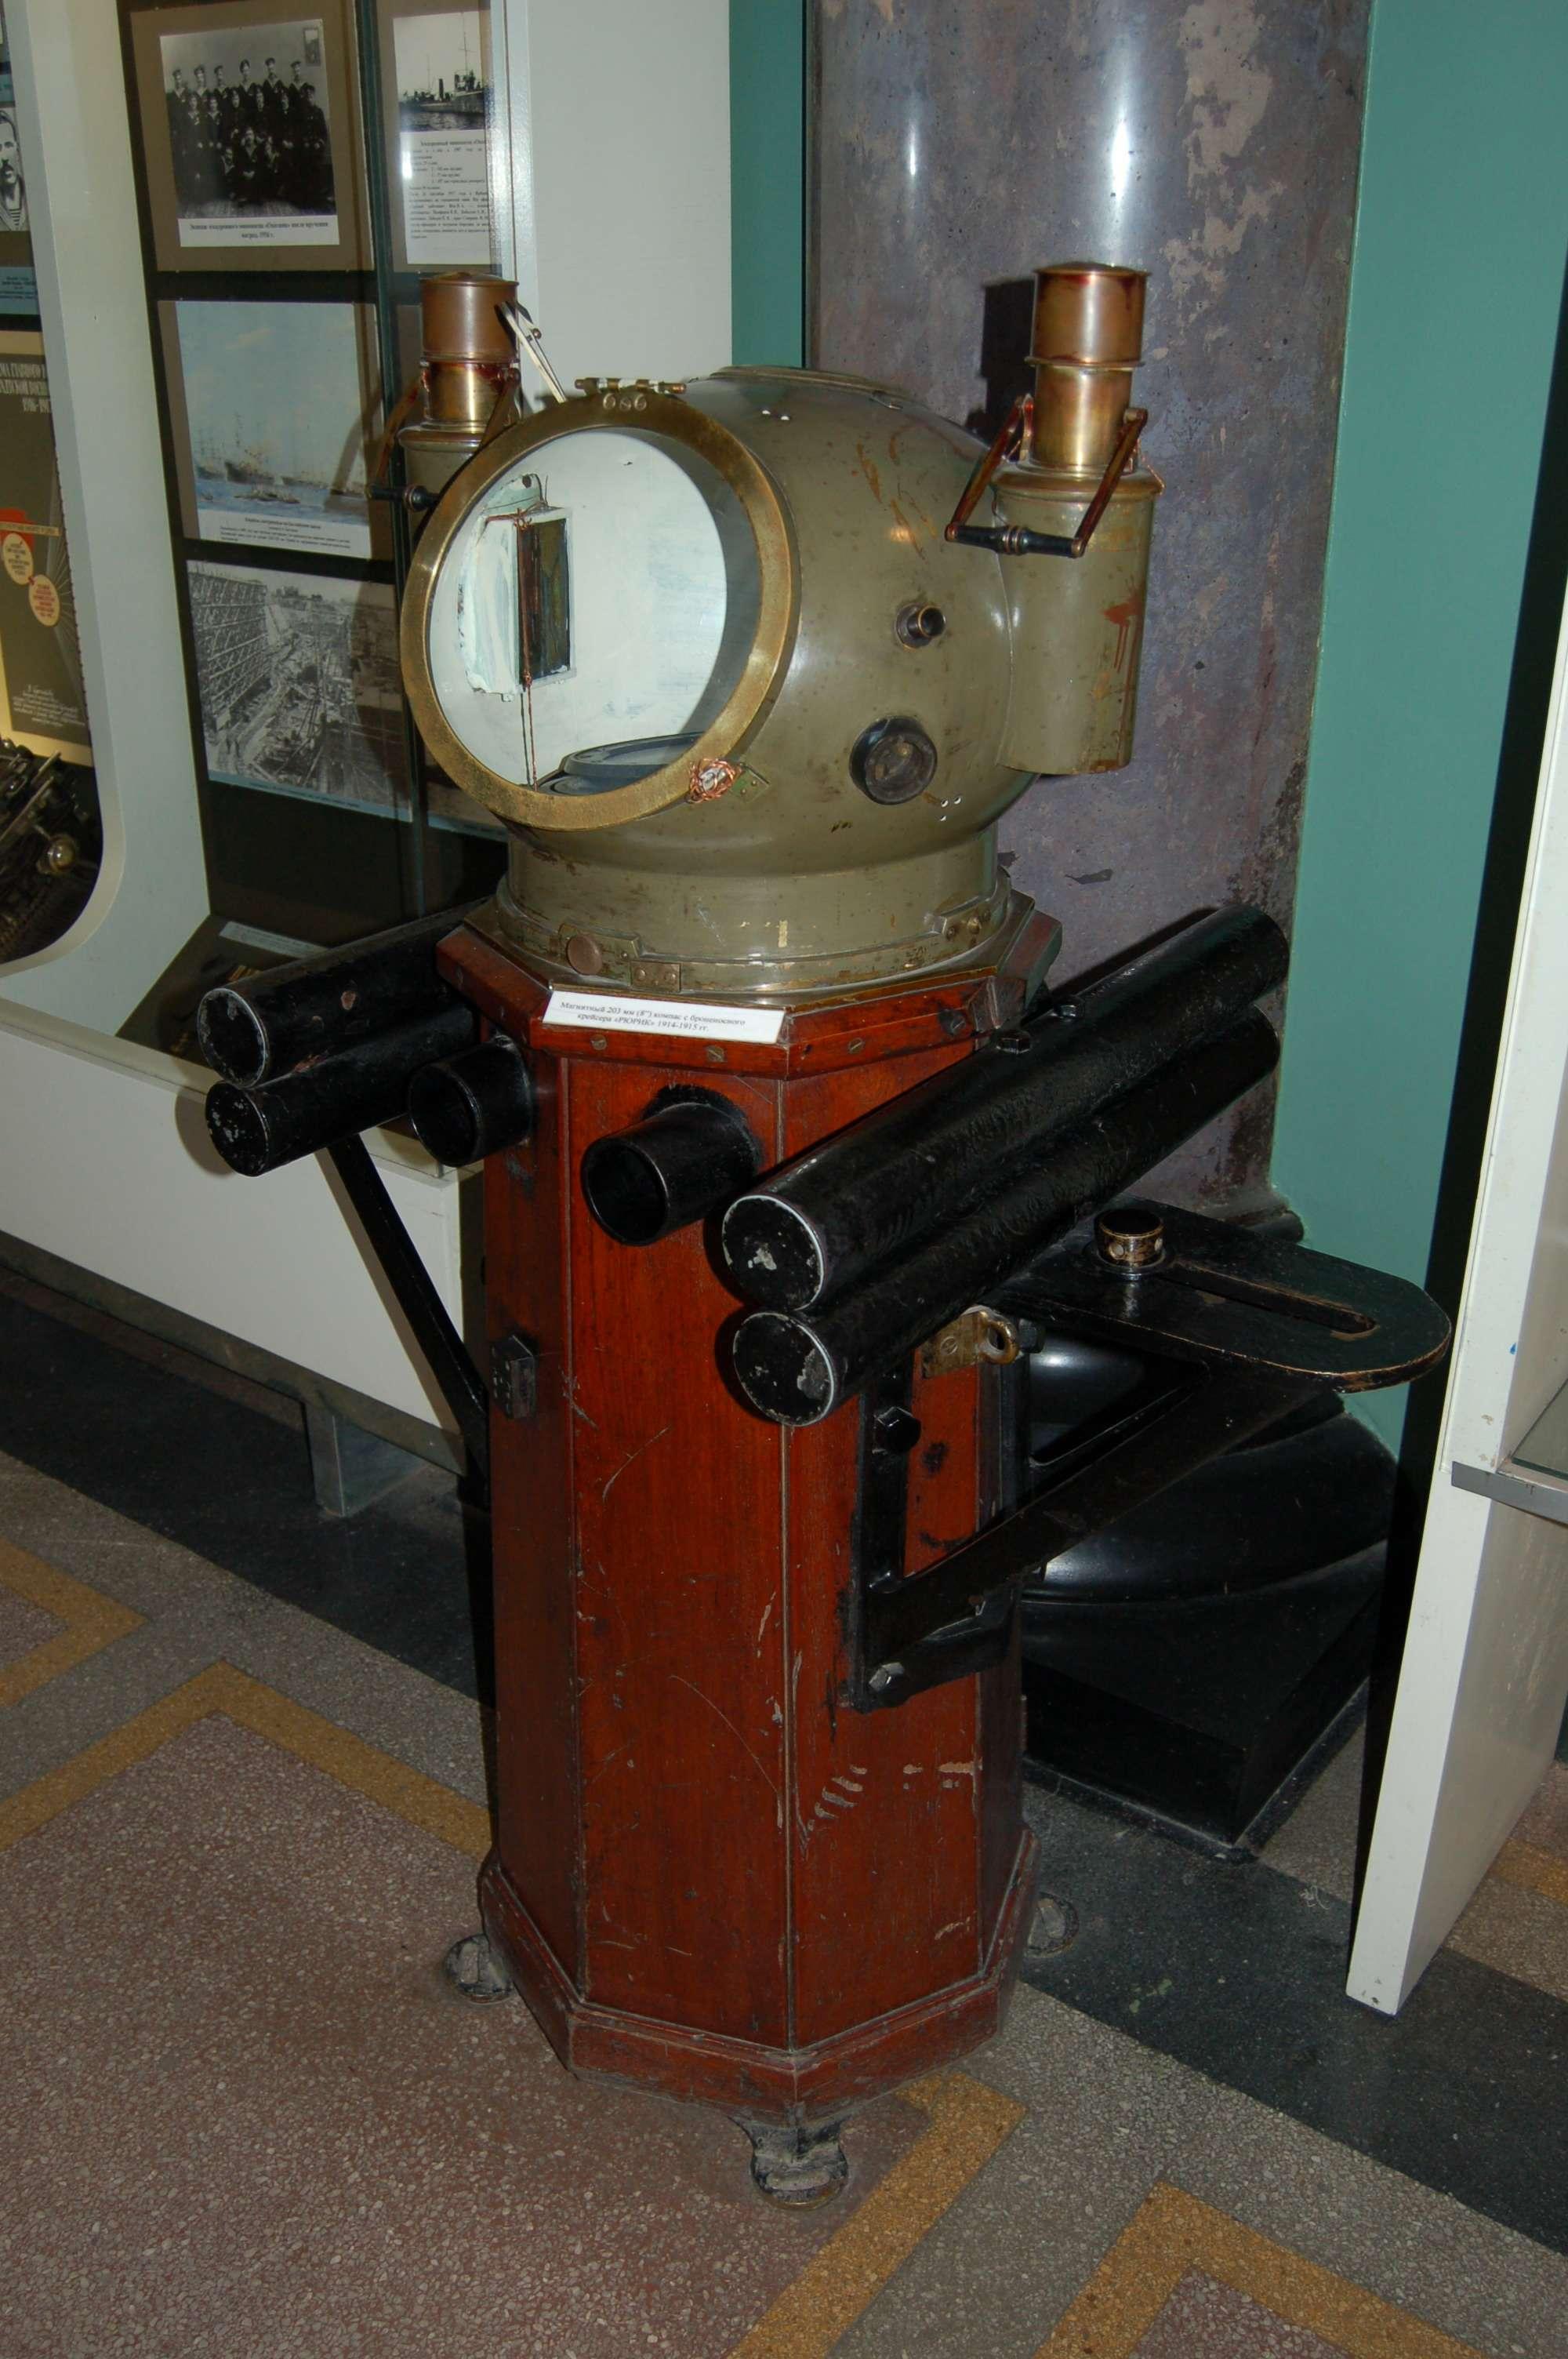 Рюрик. Магнитный 8'' компас 1914-15_02.JPG